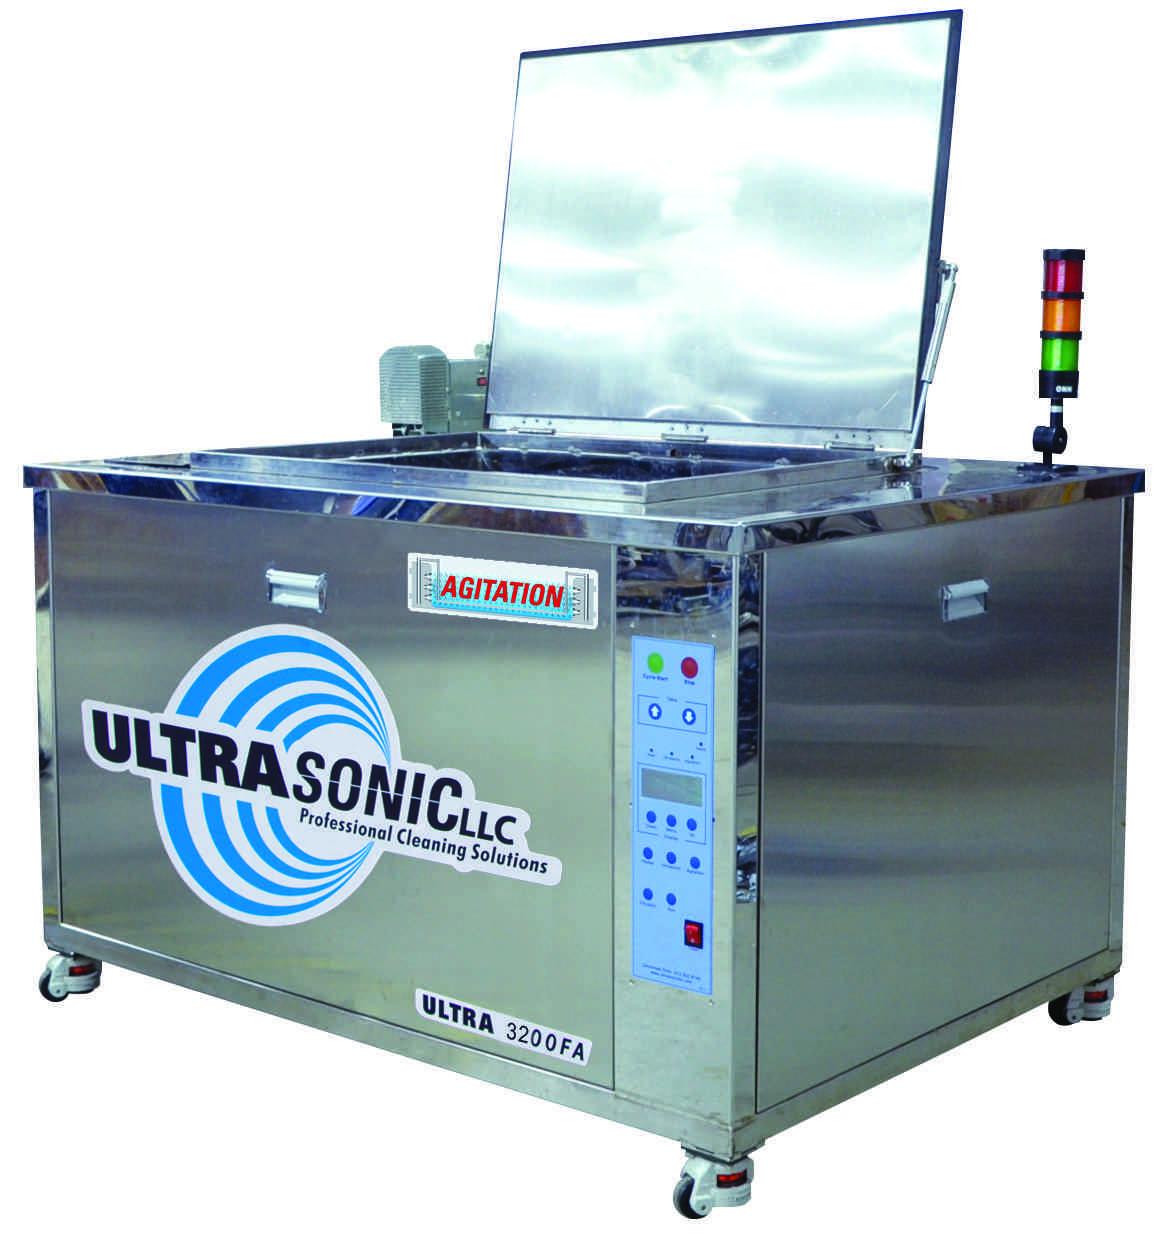 Ultrasonic Ultra 3200FA parts cleaner